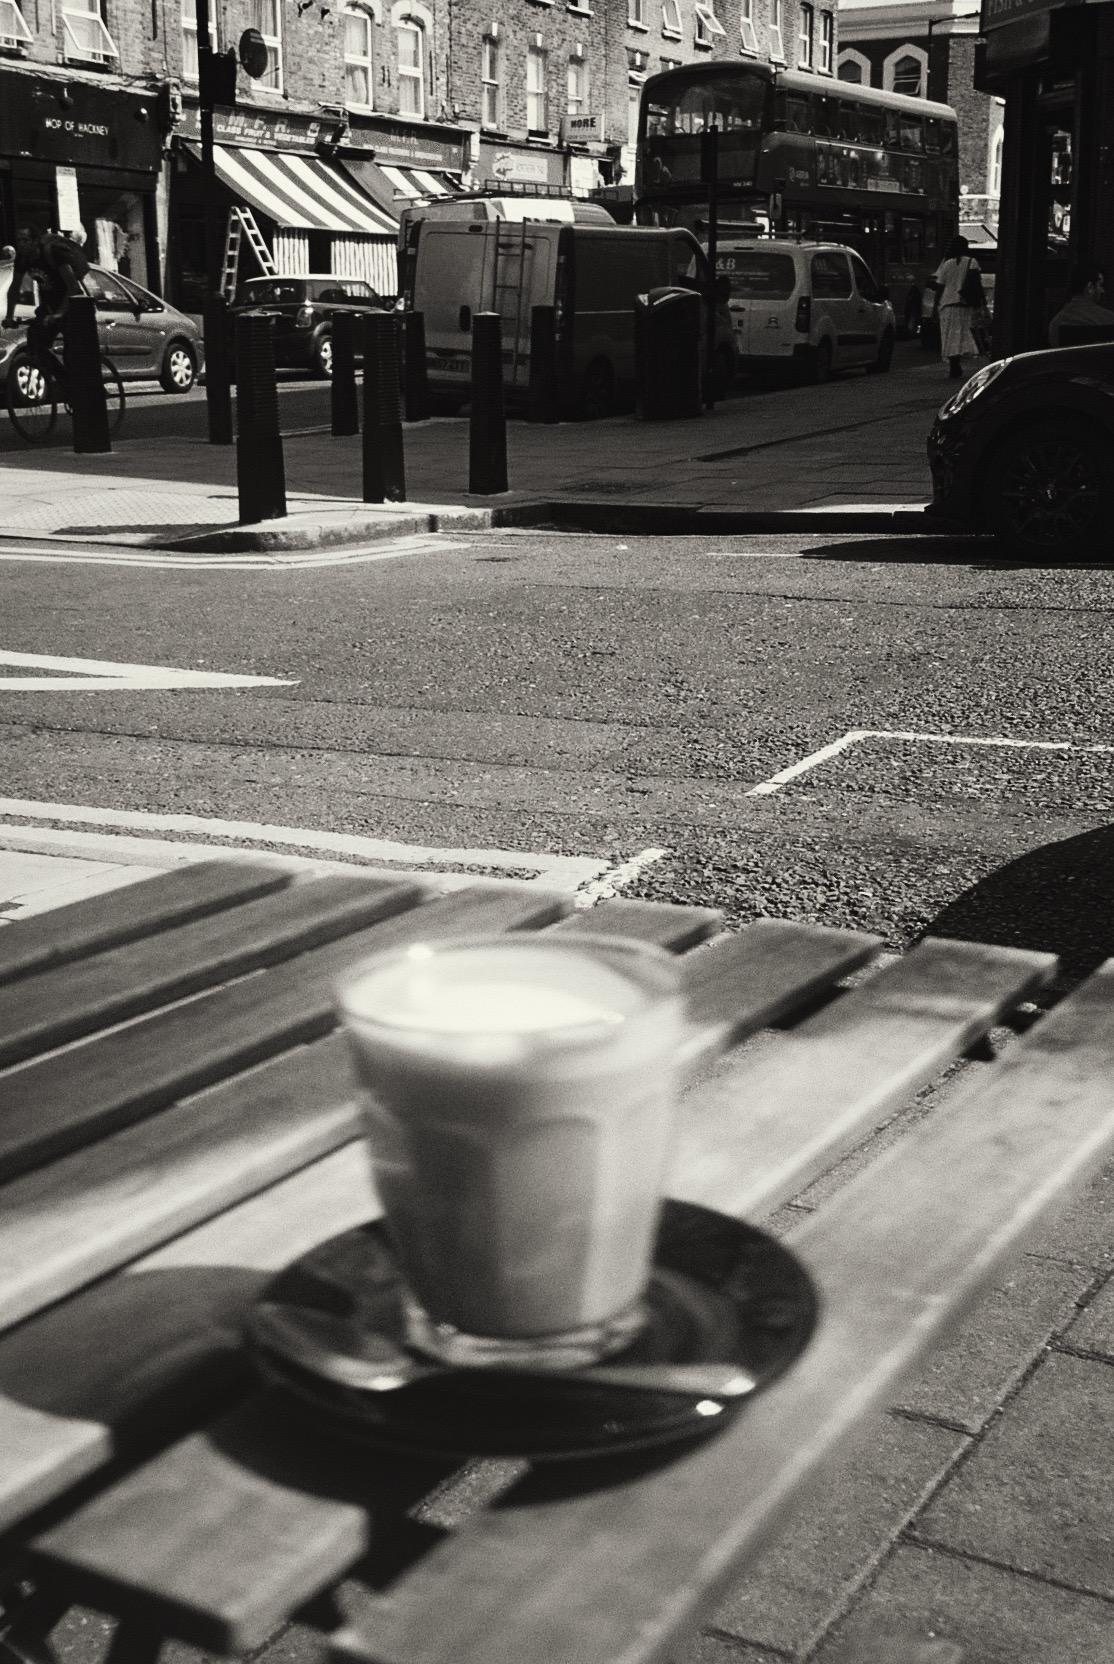 Oat latte, my usual order.  / Oat latte, o meu pedido do costume.